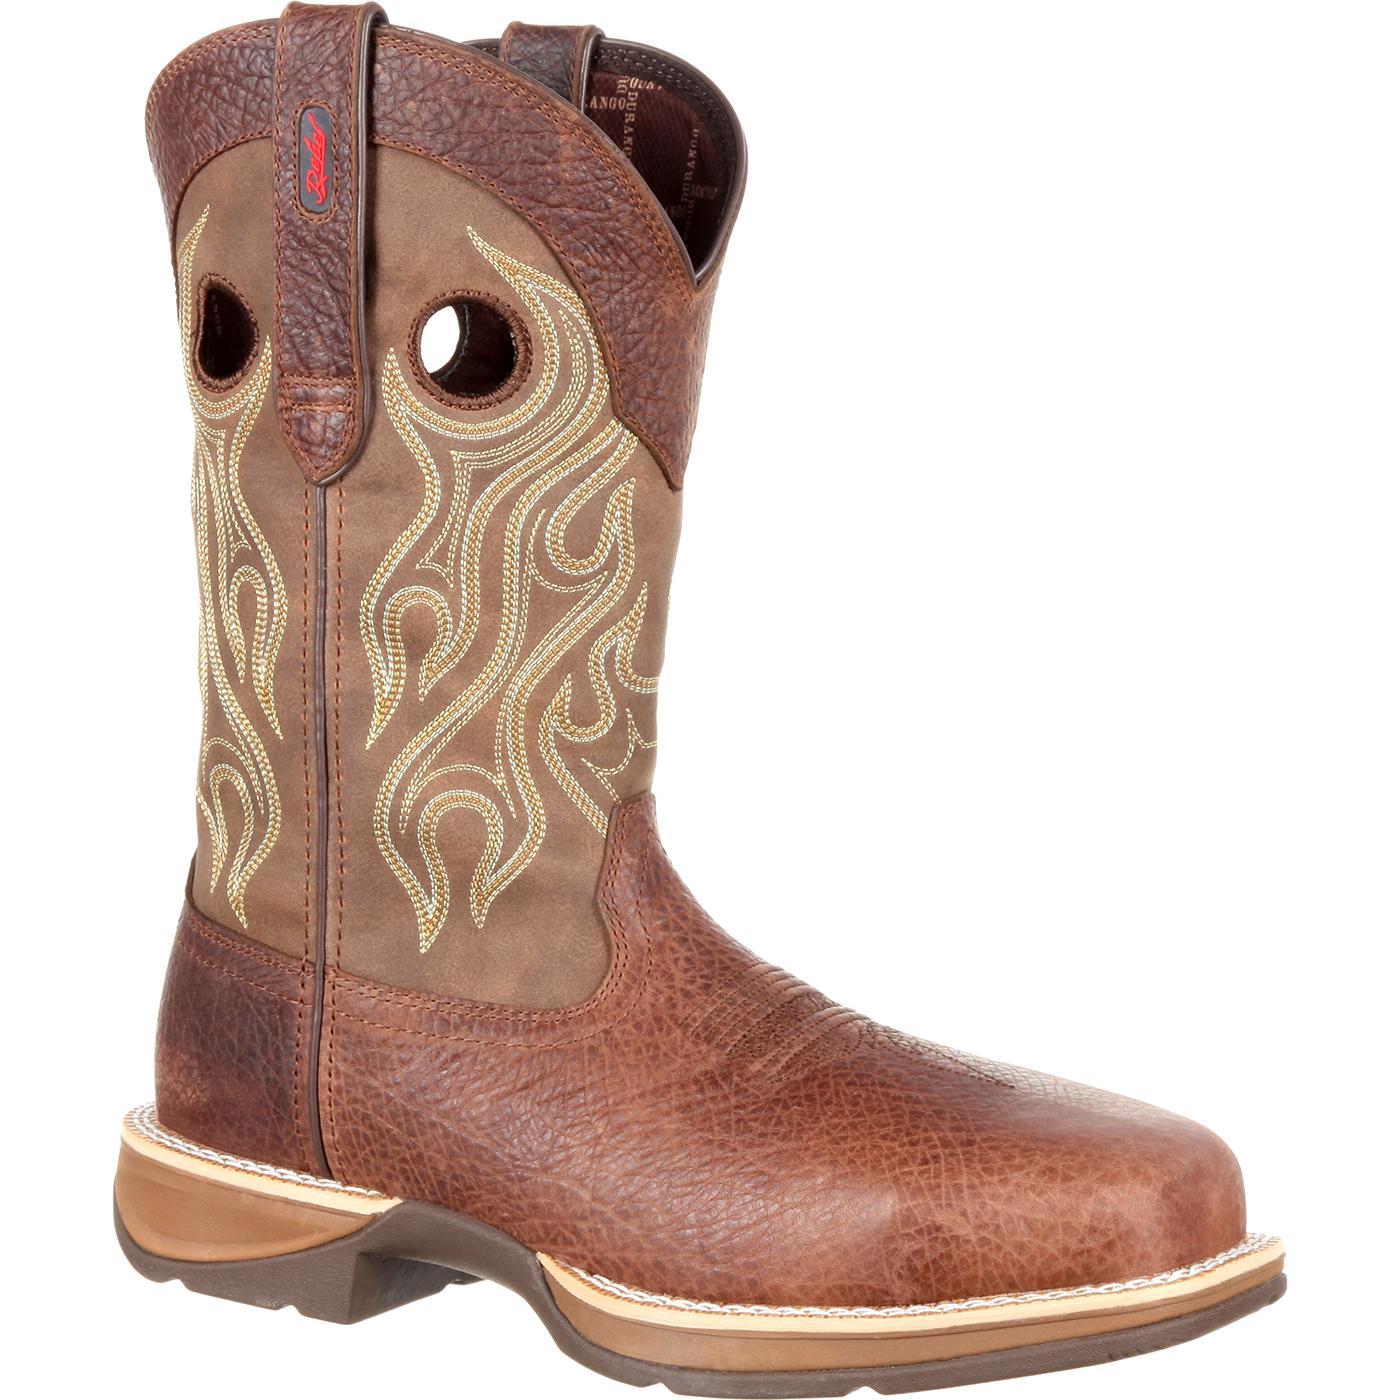 9400726344c Rebel by Durango Composite Toe Waterproof Western Boot